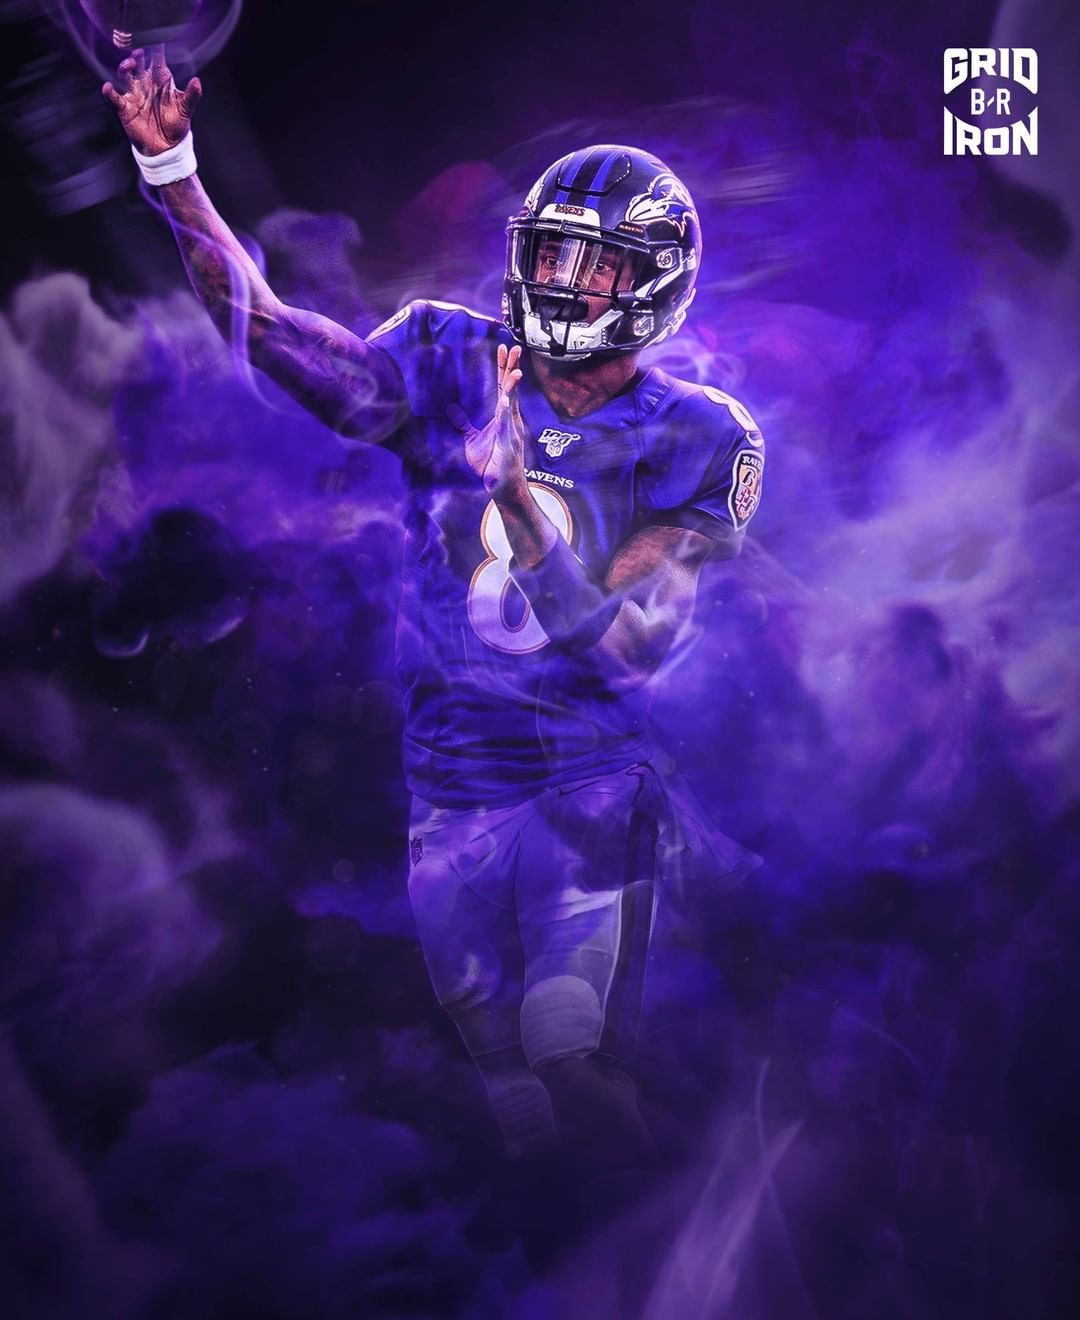 American Football Player Wallpaper Http Wallpapersalbum Com American Football Player Wallpaper Htm In 2020 Nfl Football Art Ravens Football Baltimore Ravens Football